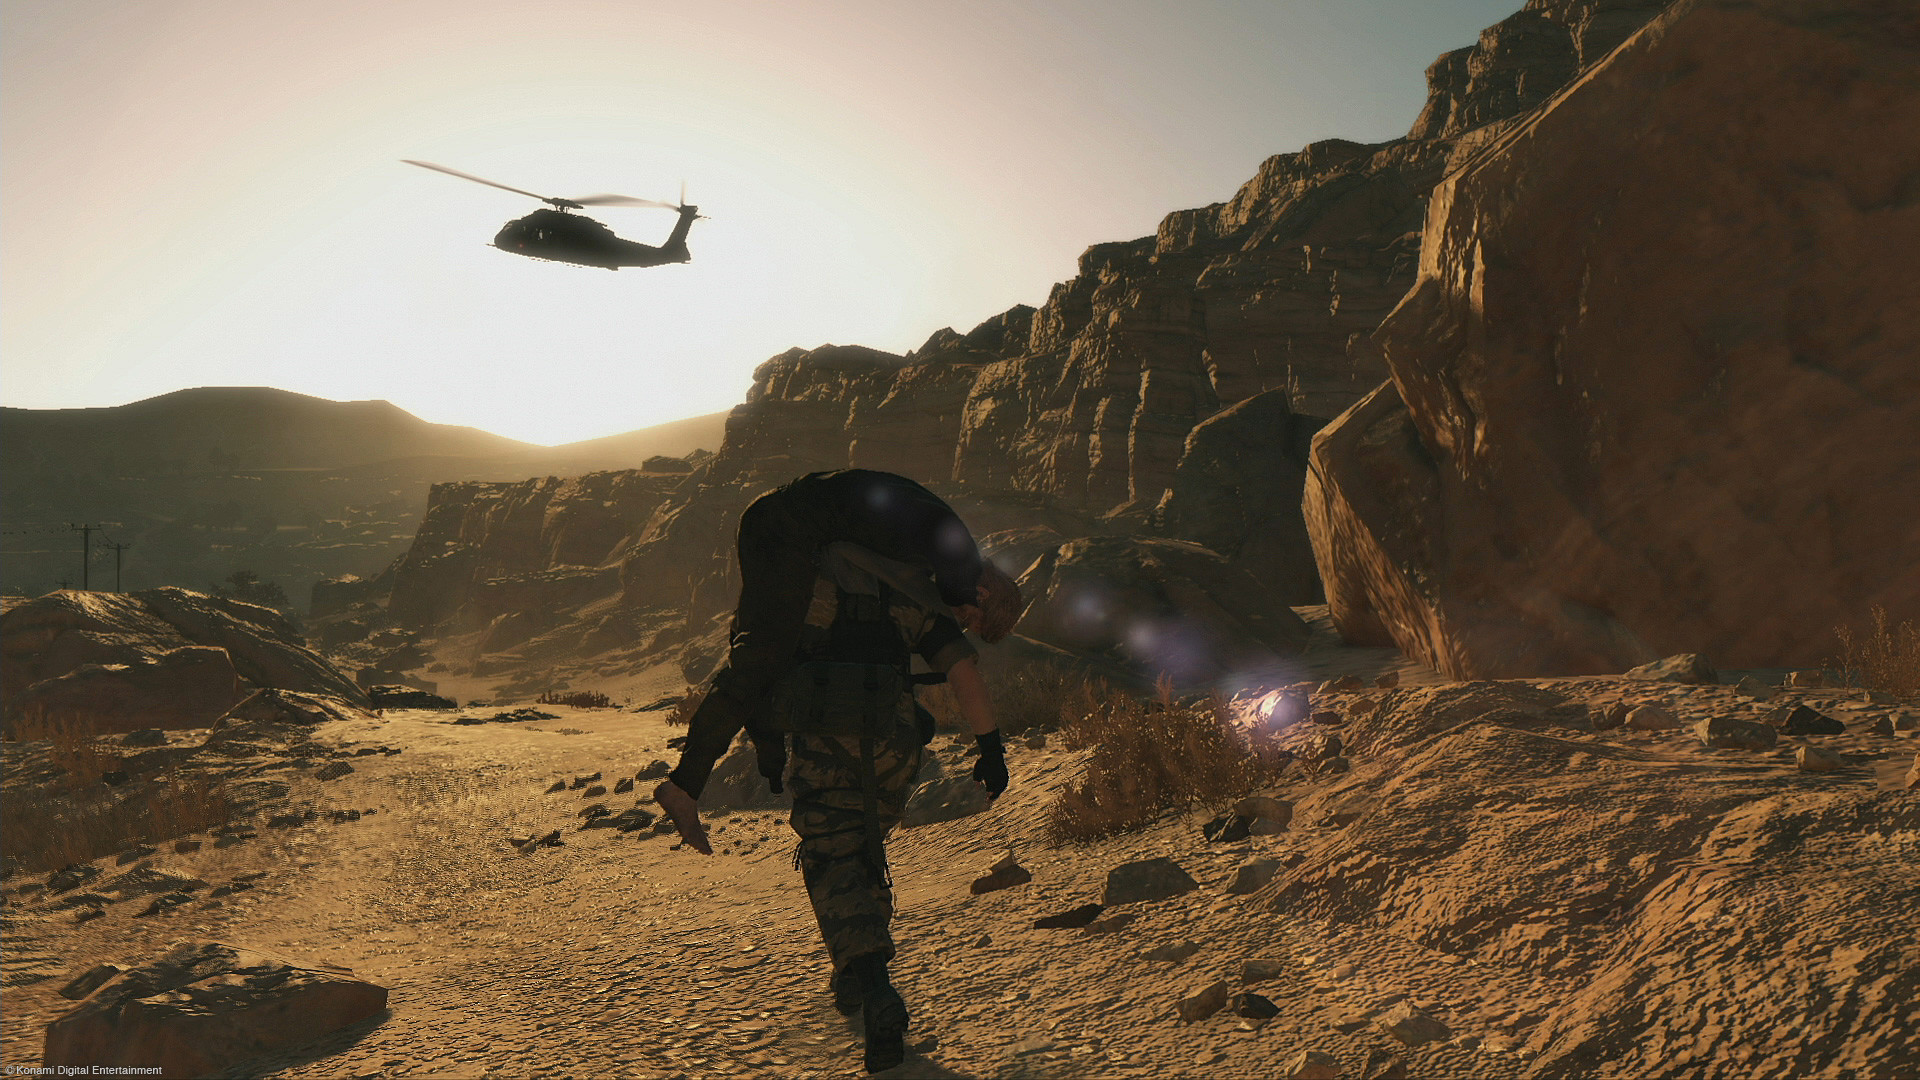 Metal Gear Solid 5: The Phantom Pain – Aim True, Ye Vengeful Mission  Objectives